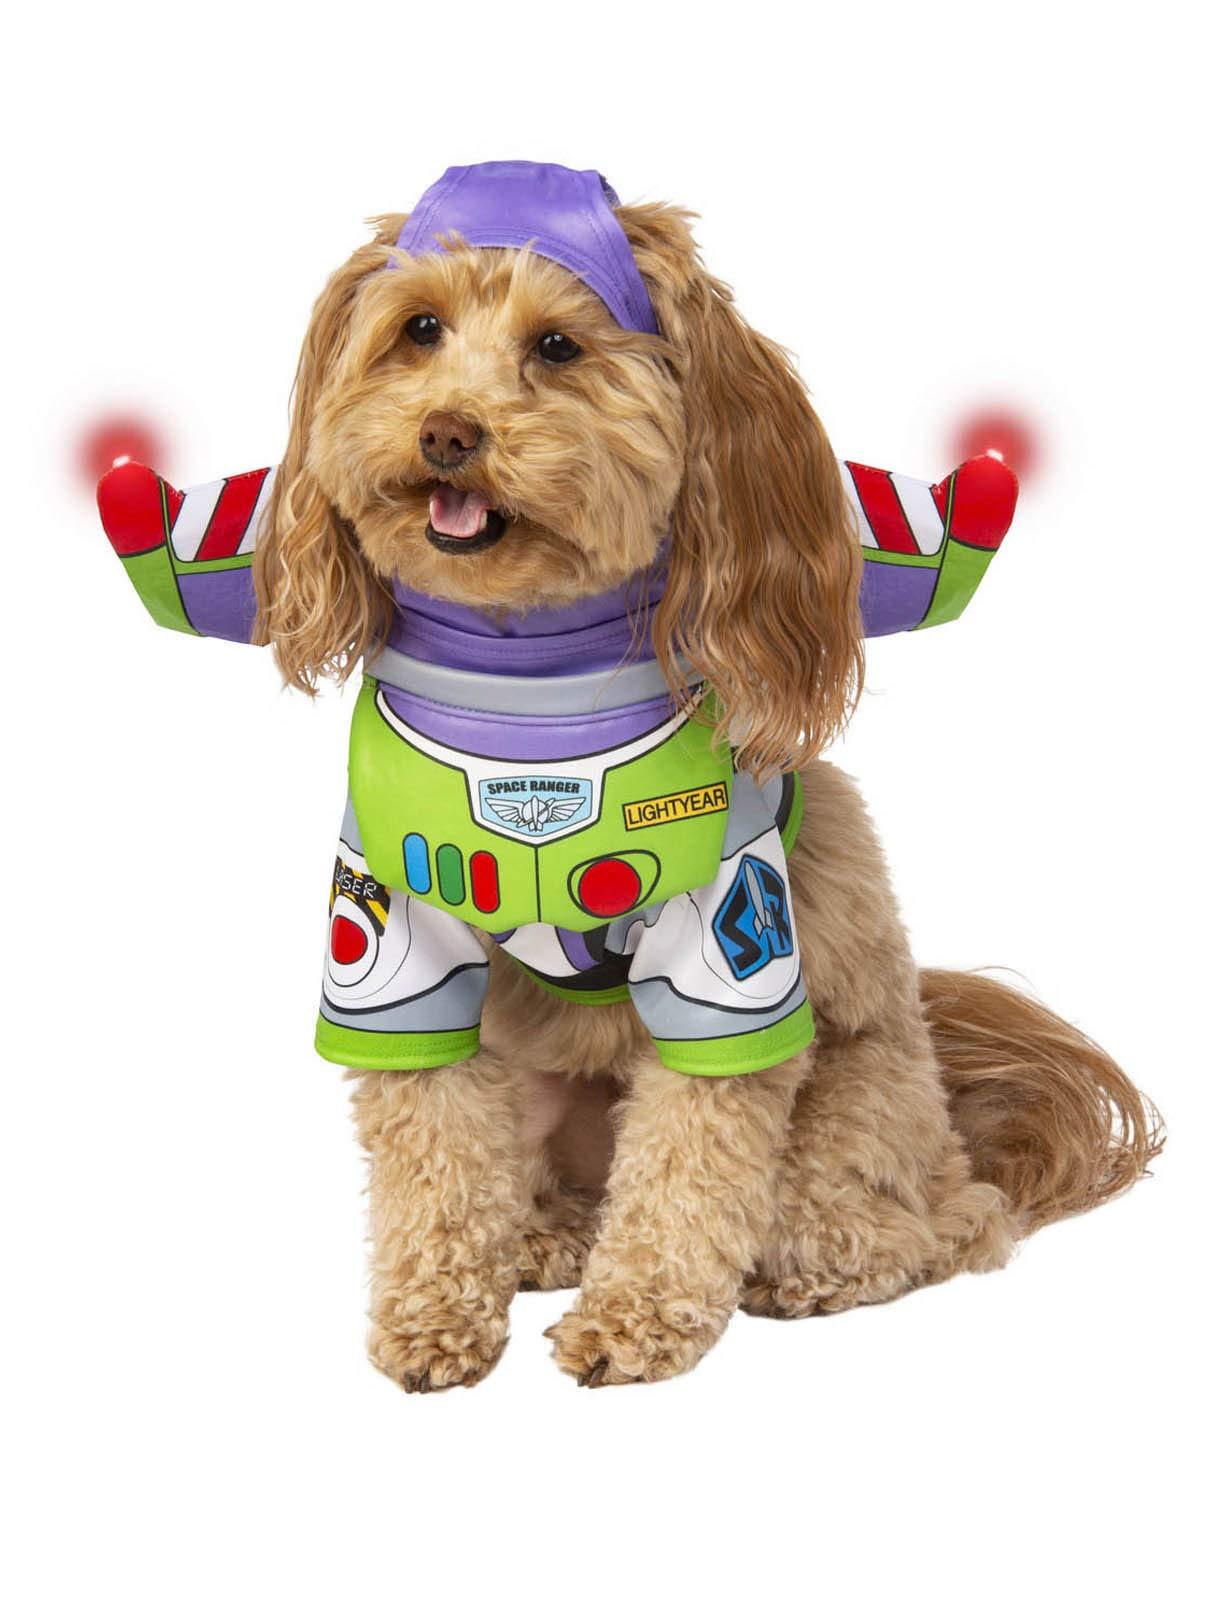 Rubie's Disney: Toy Story Pet Costume, Buzz Lightyear, X-Large